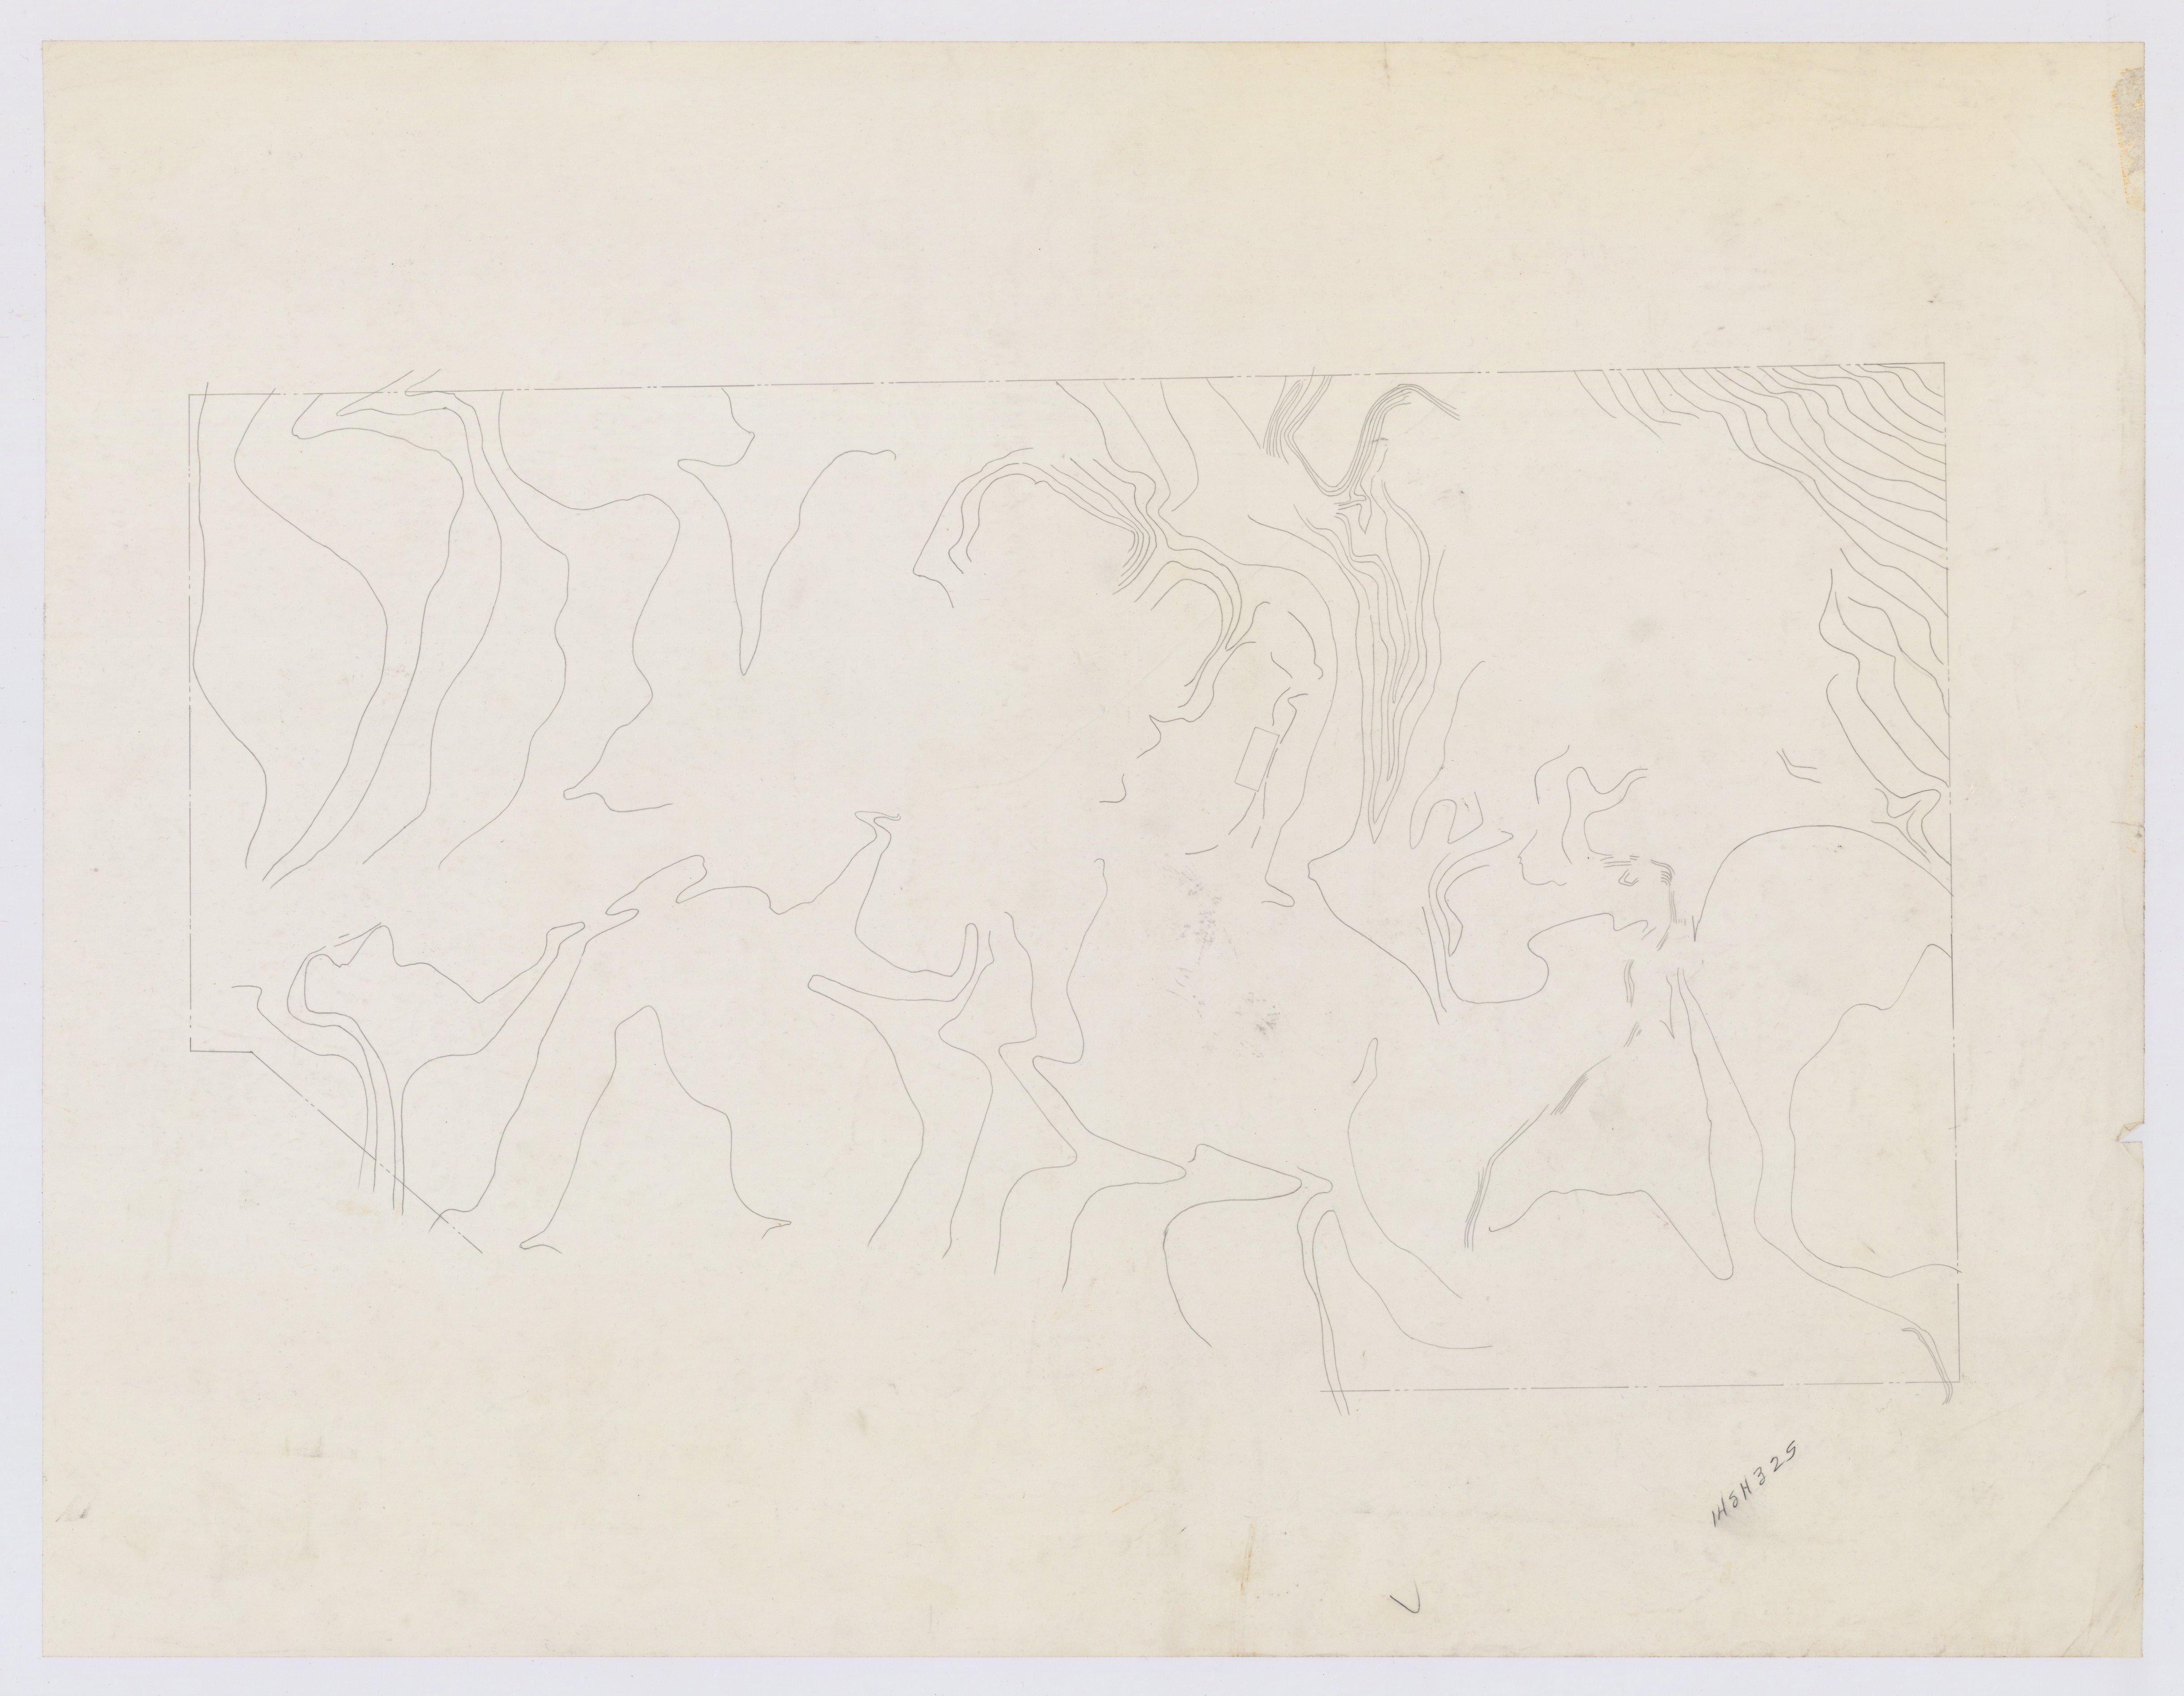 Oversized Maps of the Pottawatomi Mission, 14SH325 - 9